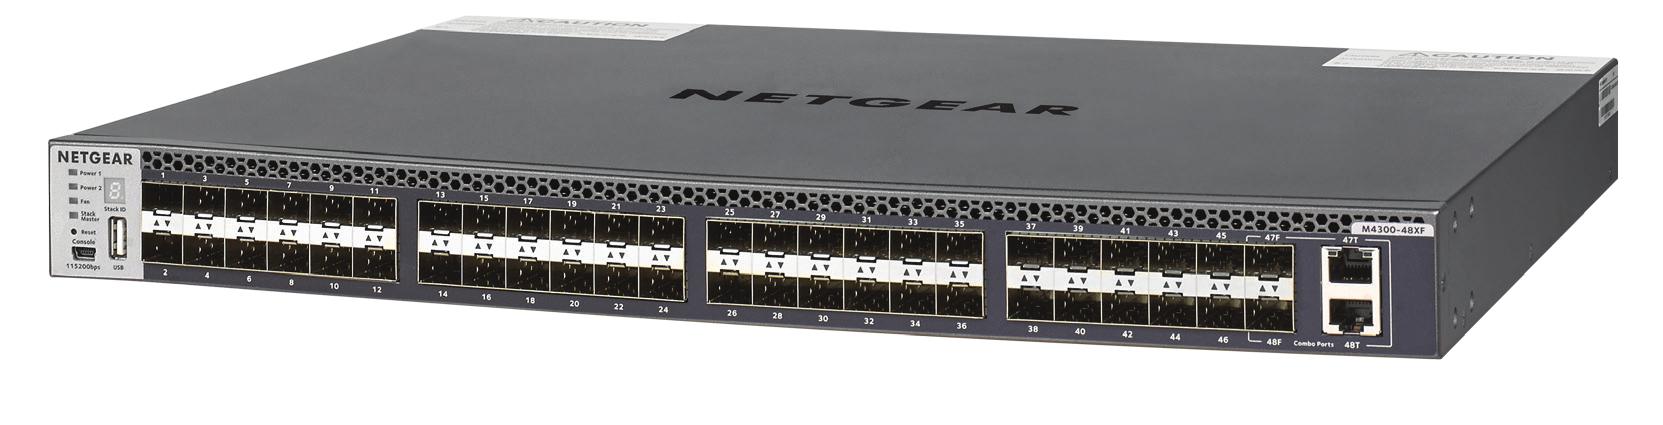 Netgear M4300-48XF Managed L3 10G Ethernet (100/1000/10000) Black